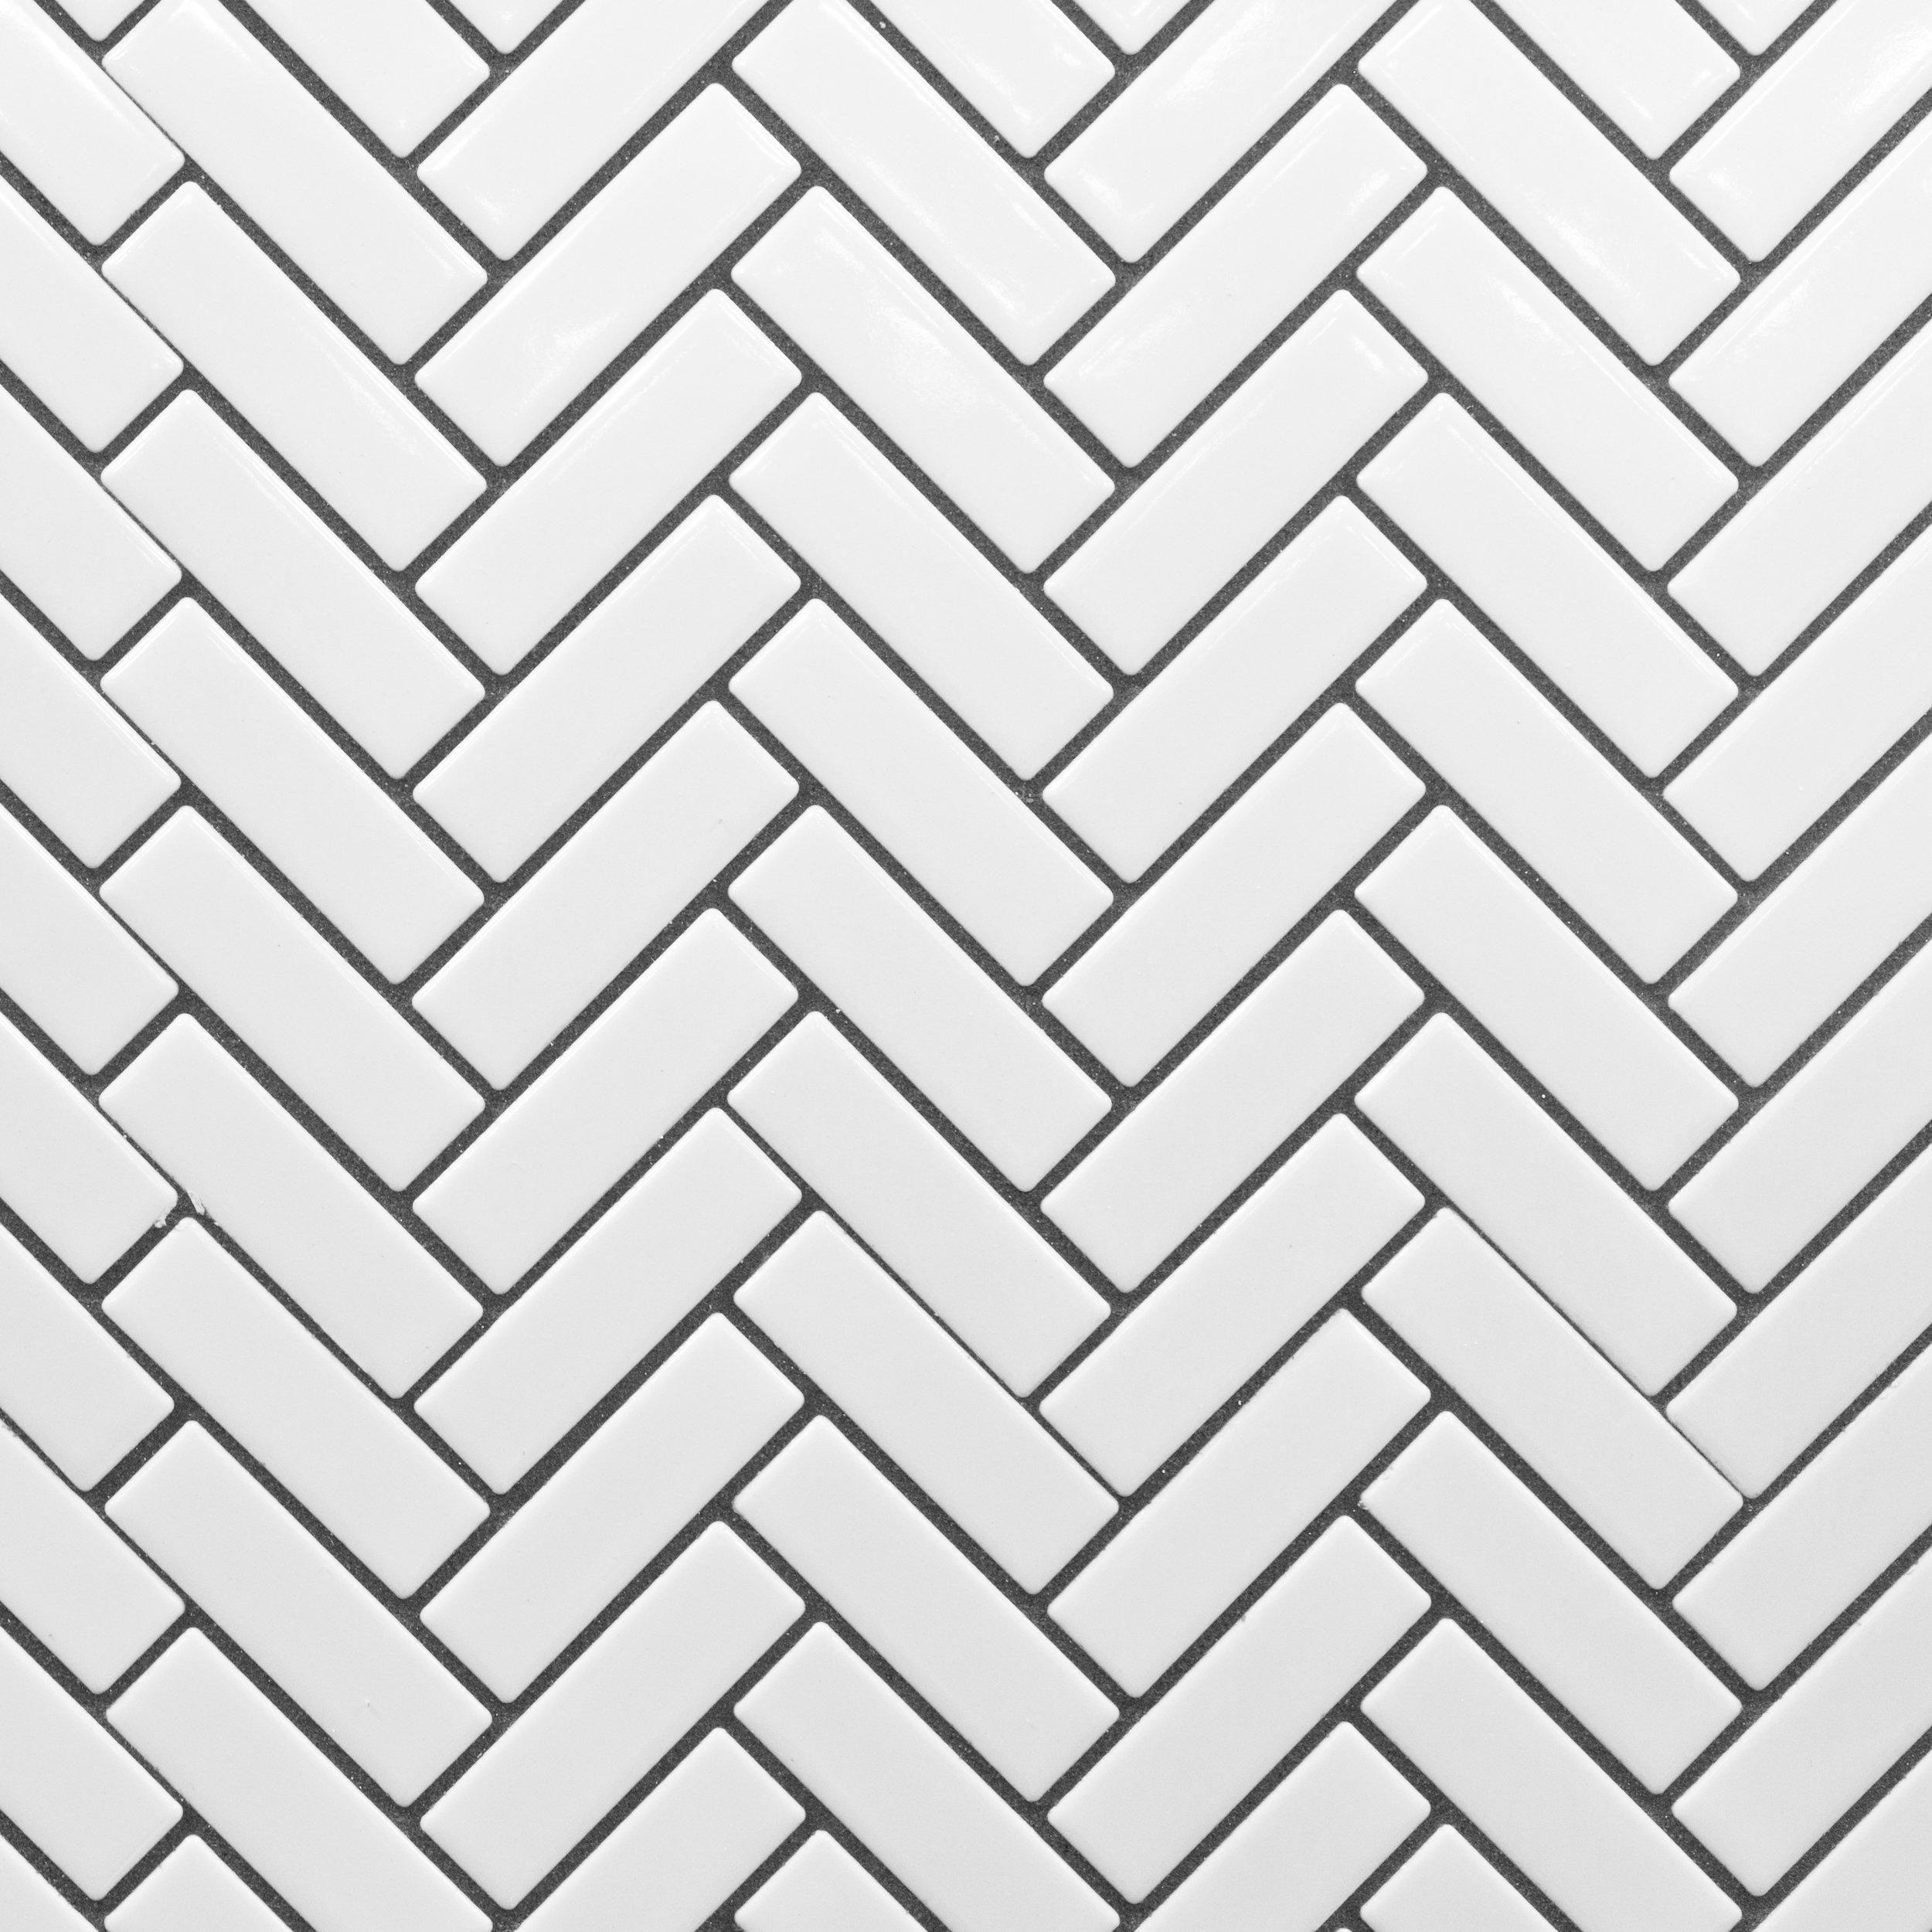 White Herringbone Porcelain Mosaic Floor Decor White Herringbone Tile Floor Herringbone Tile Floors Mosaic Flooring